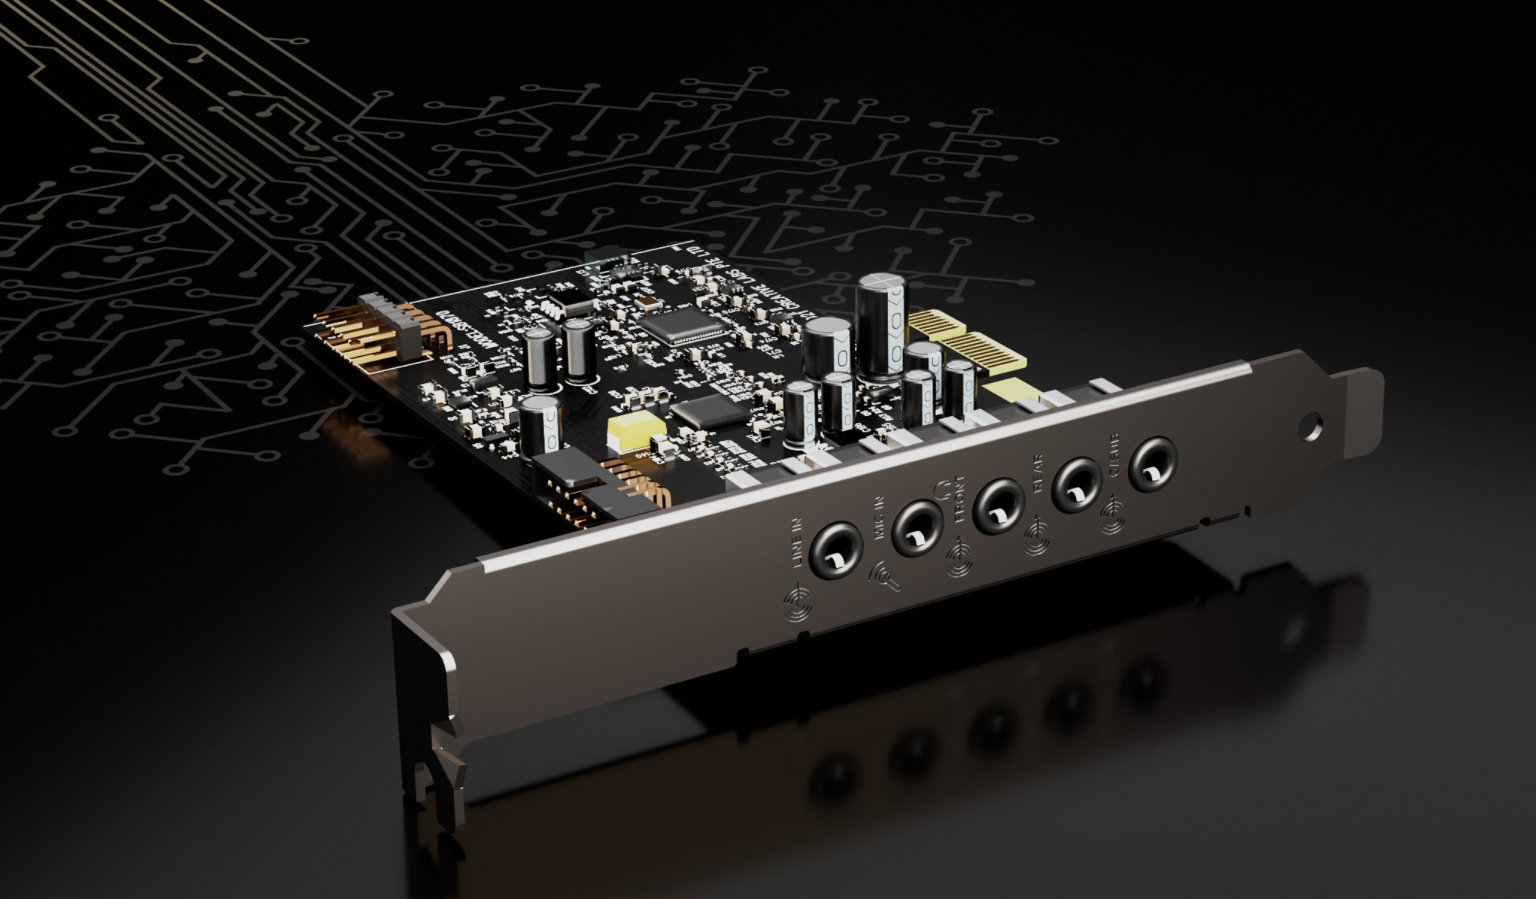 Creative Sound Blaster FX V2